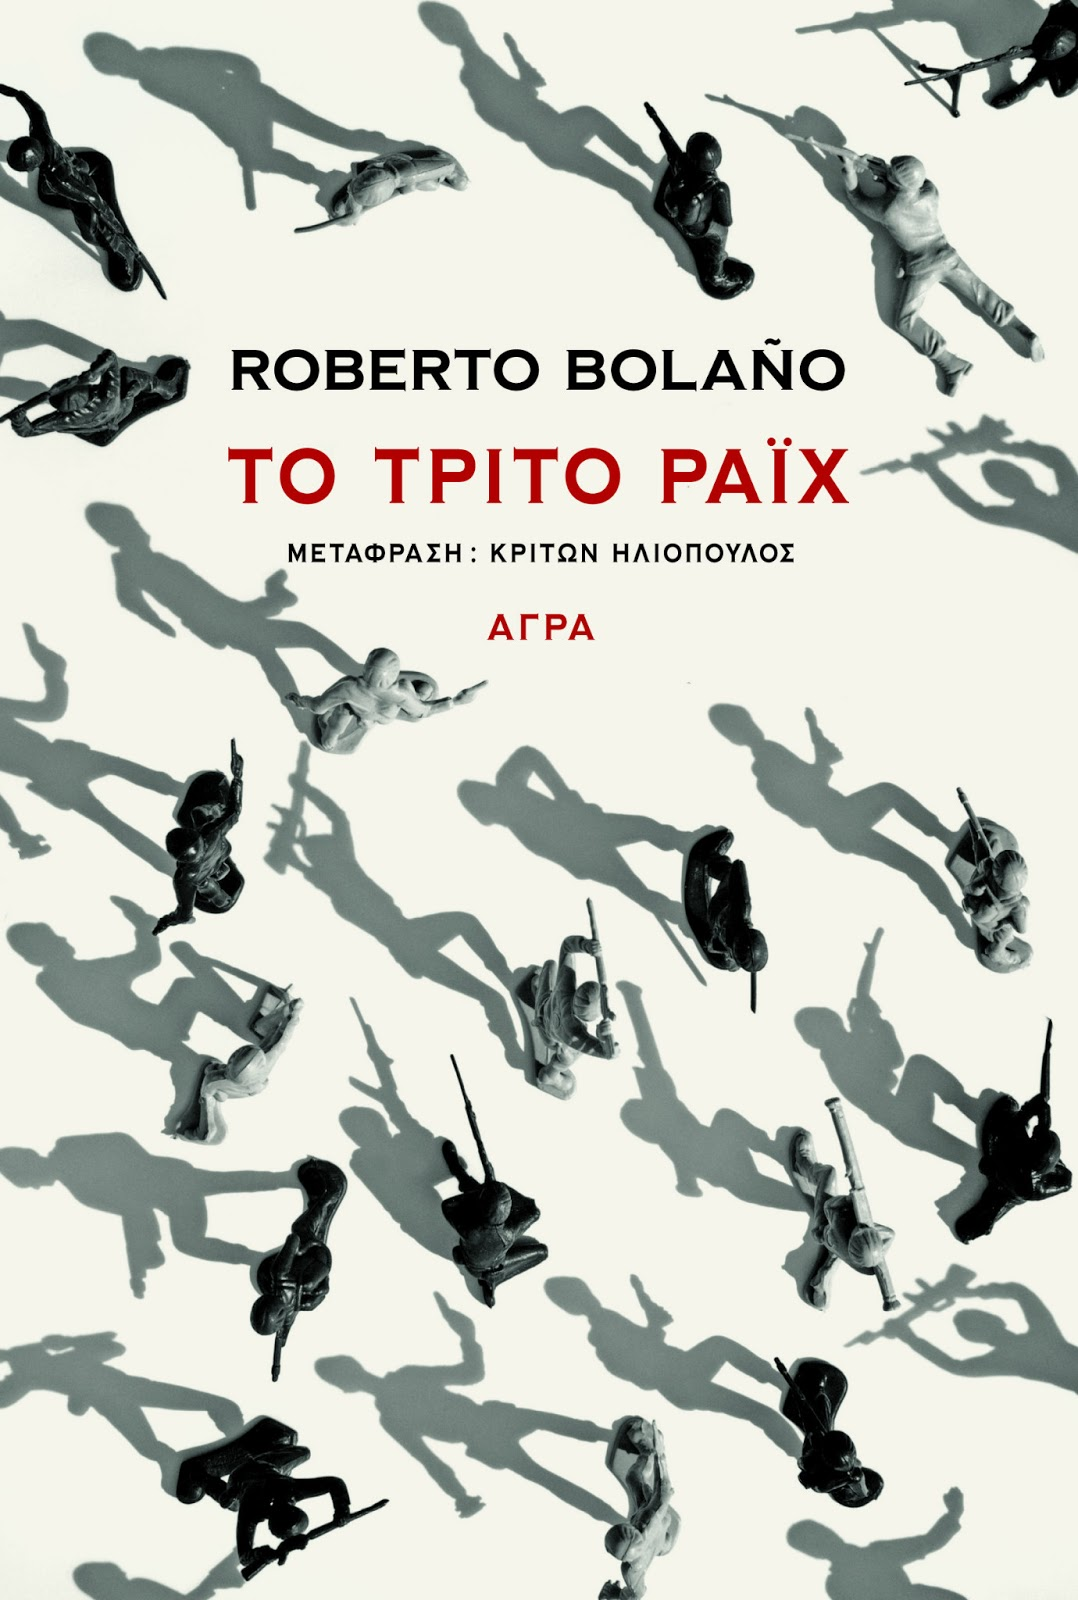 http://agrapublications.blogspot.gr/2013/07/roberto-bolano.html